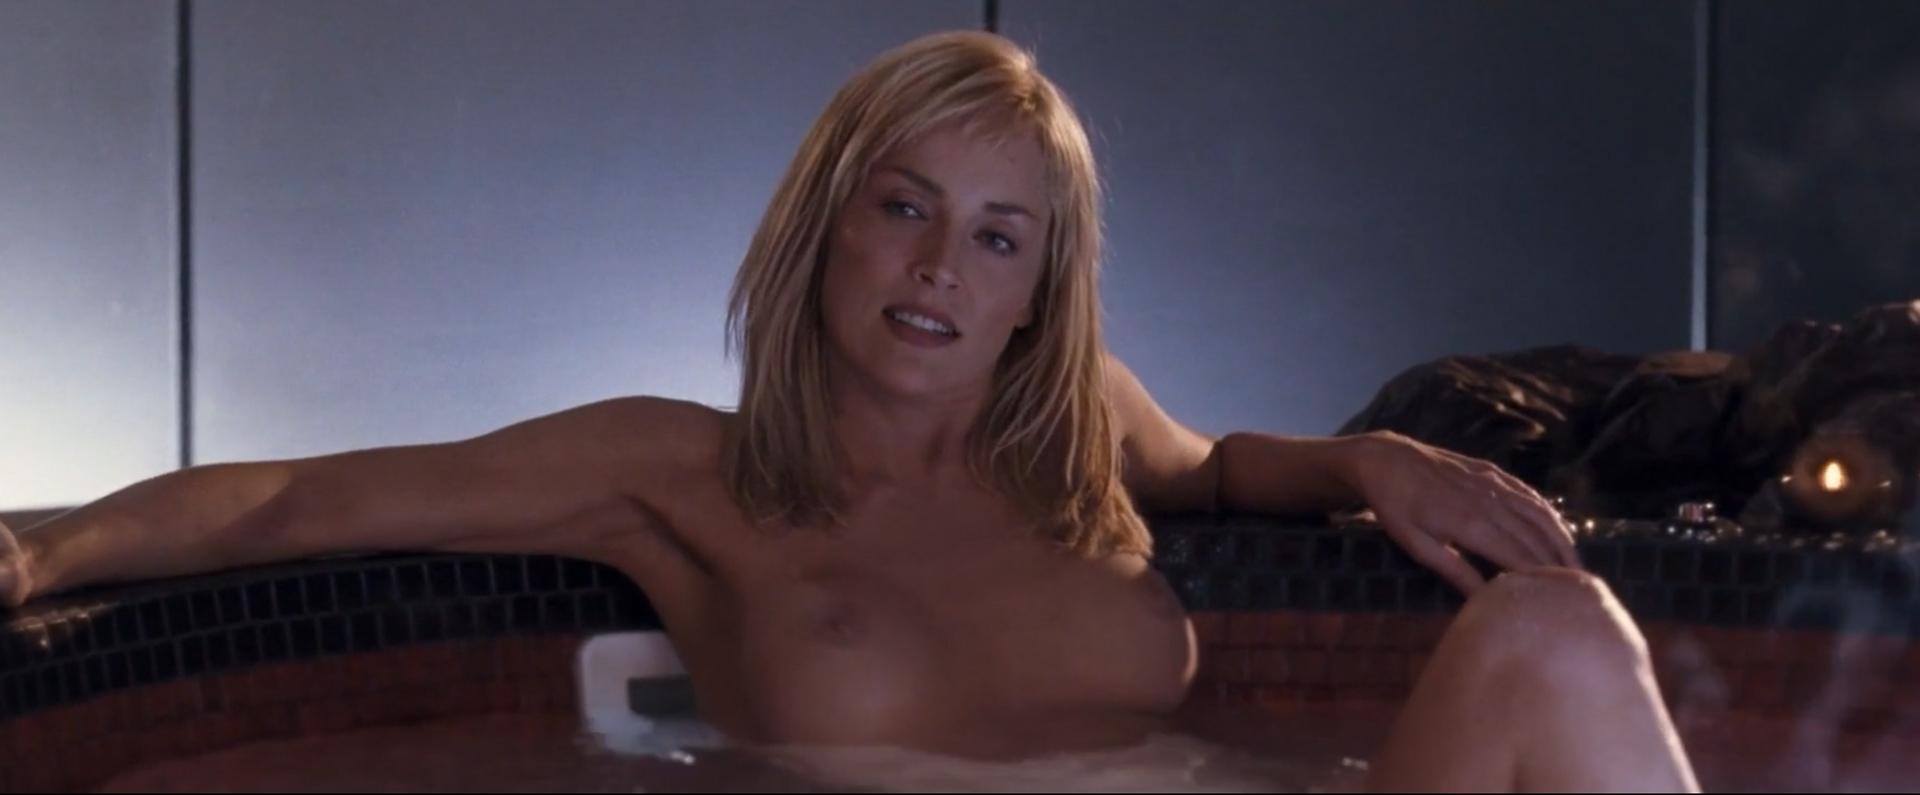 Sharon stone nude